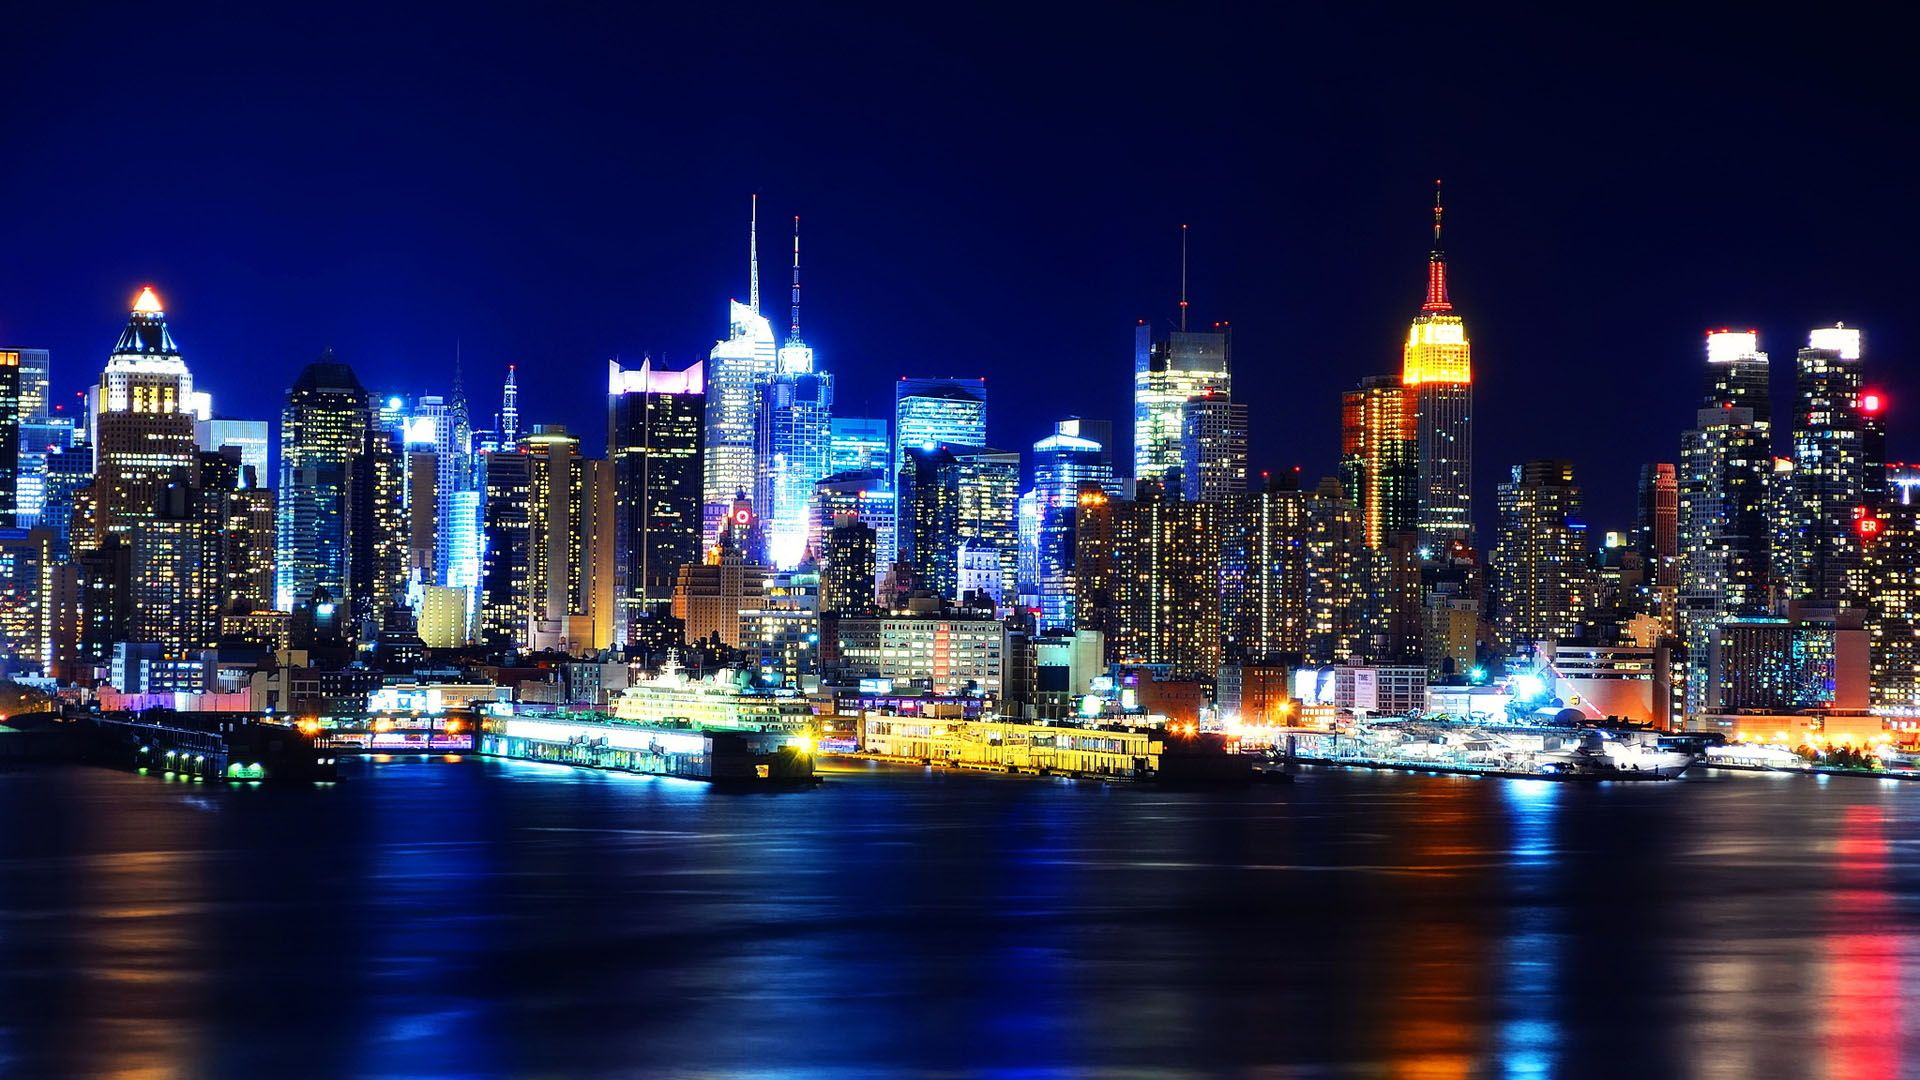 New York Skyline Hd Wallpapers New York Wallpaper New York Night City Wallpaper